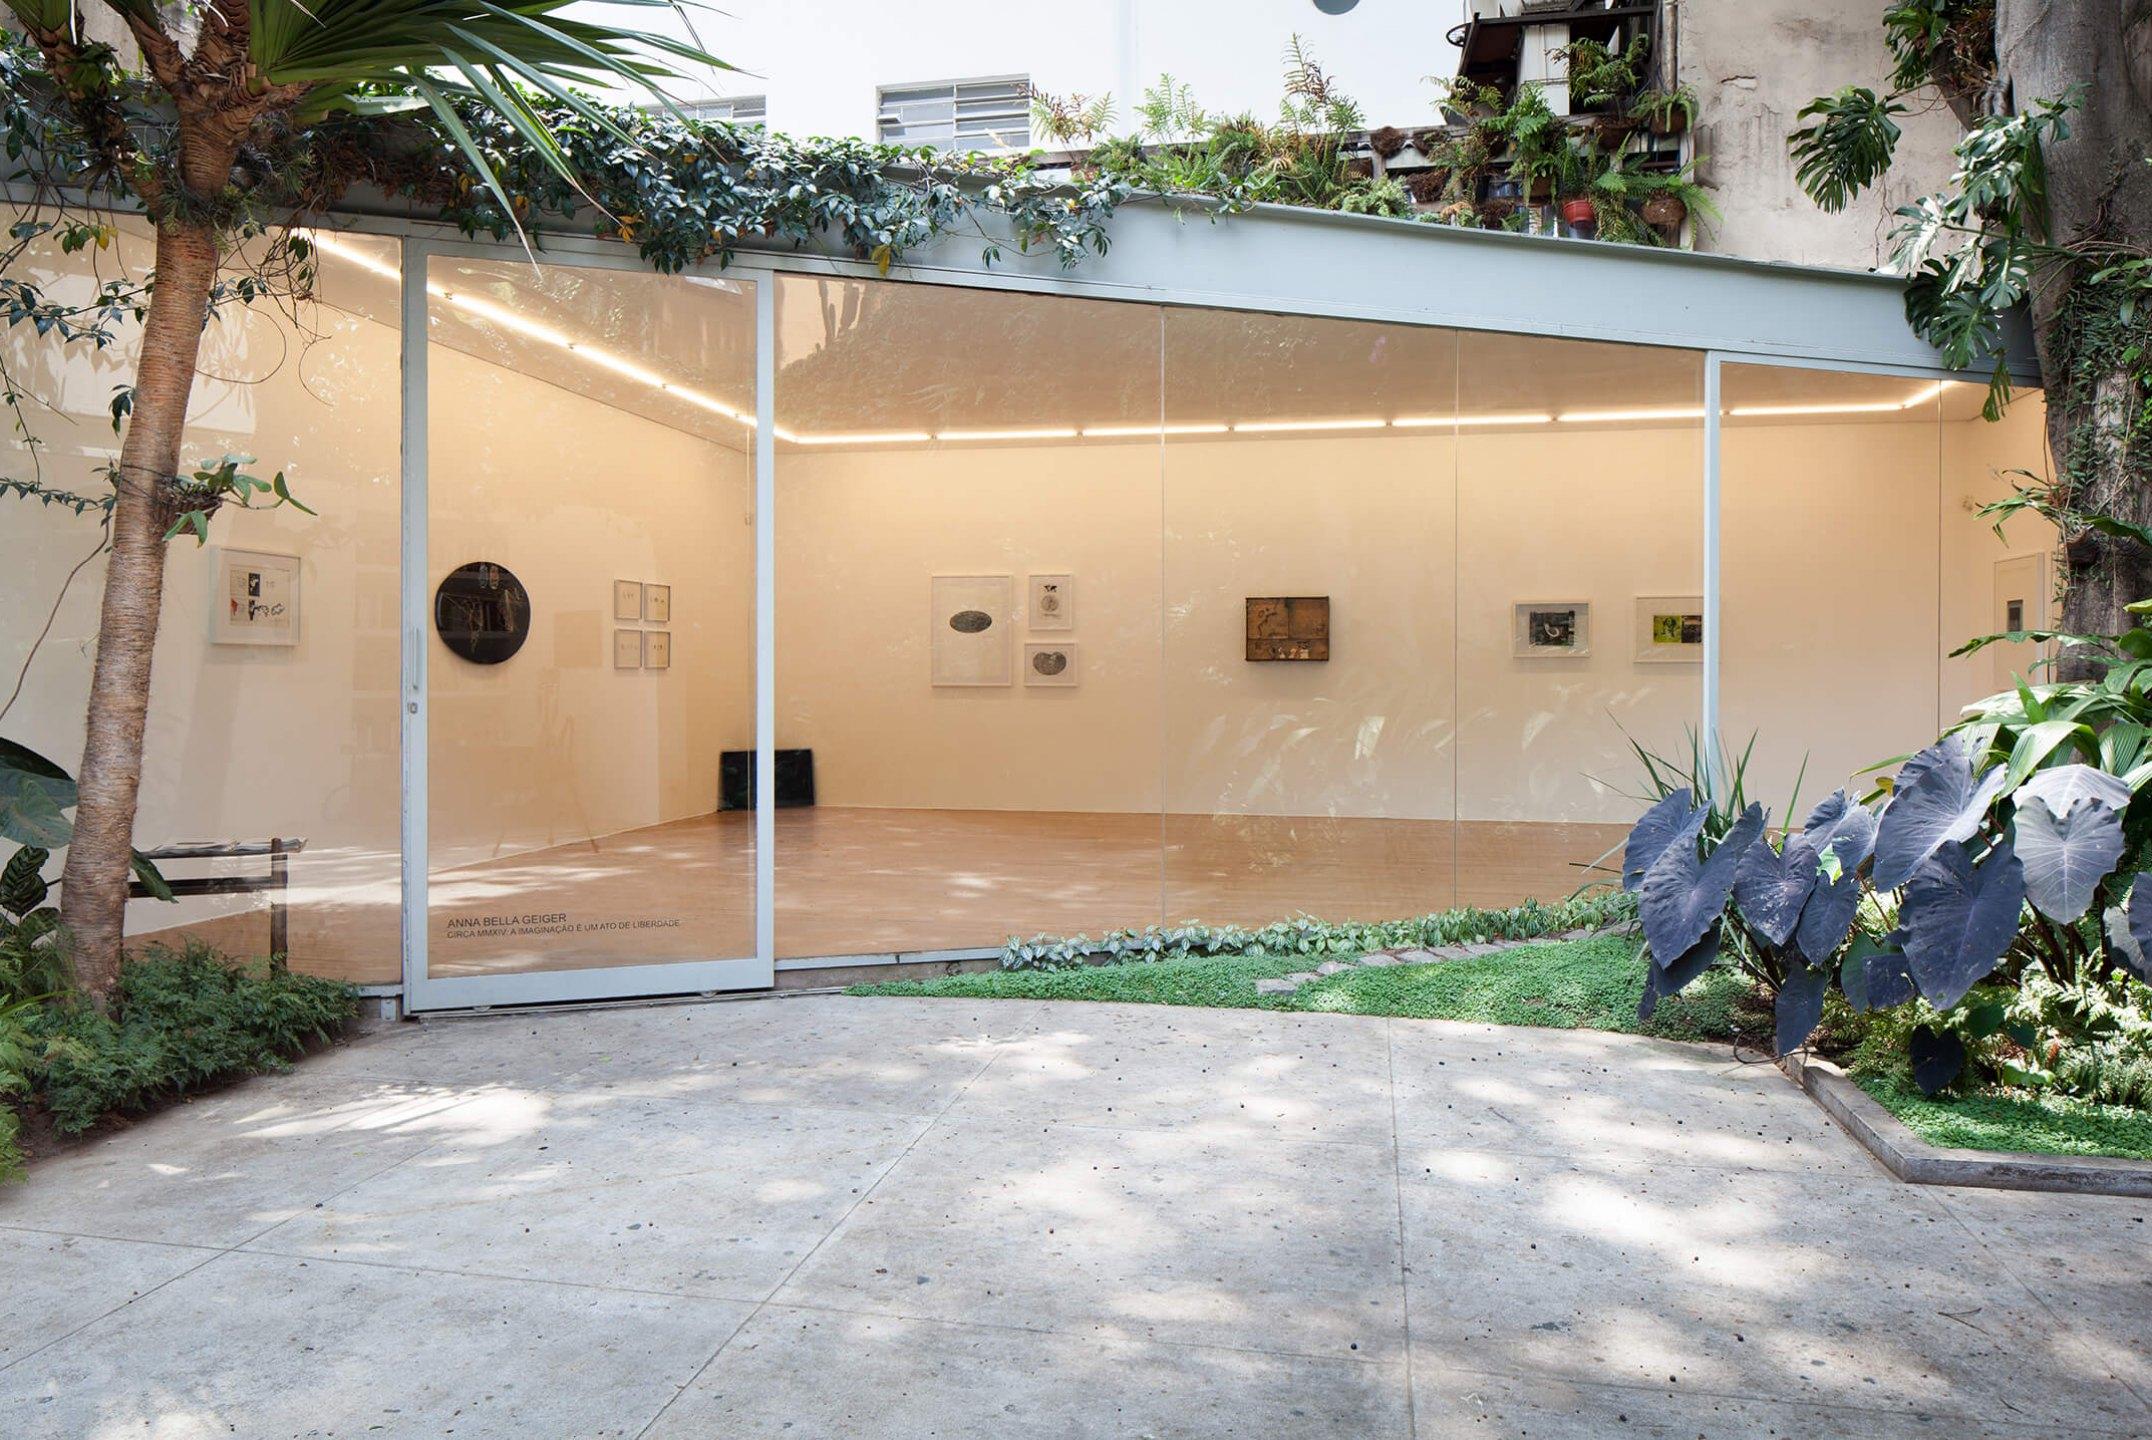 Anna Bella Geiger,<em>Circa MMXIV: Imagination is an Act of Freedom</em>, Mendes Wood DM, São Paulo, 2014 - Mendes Wood DM